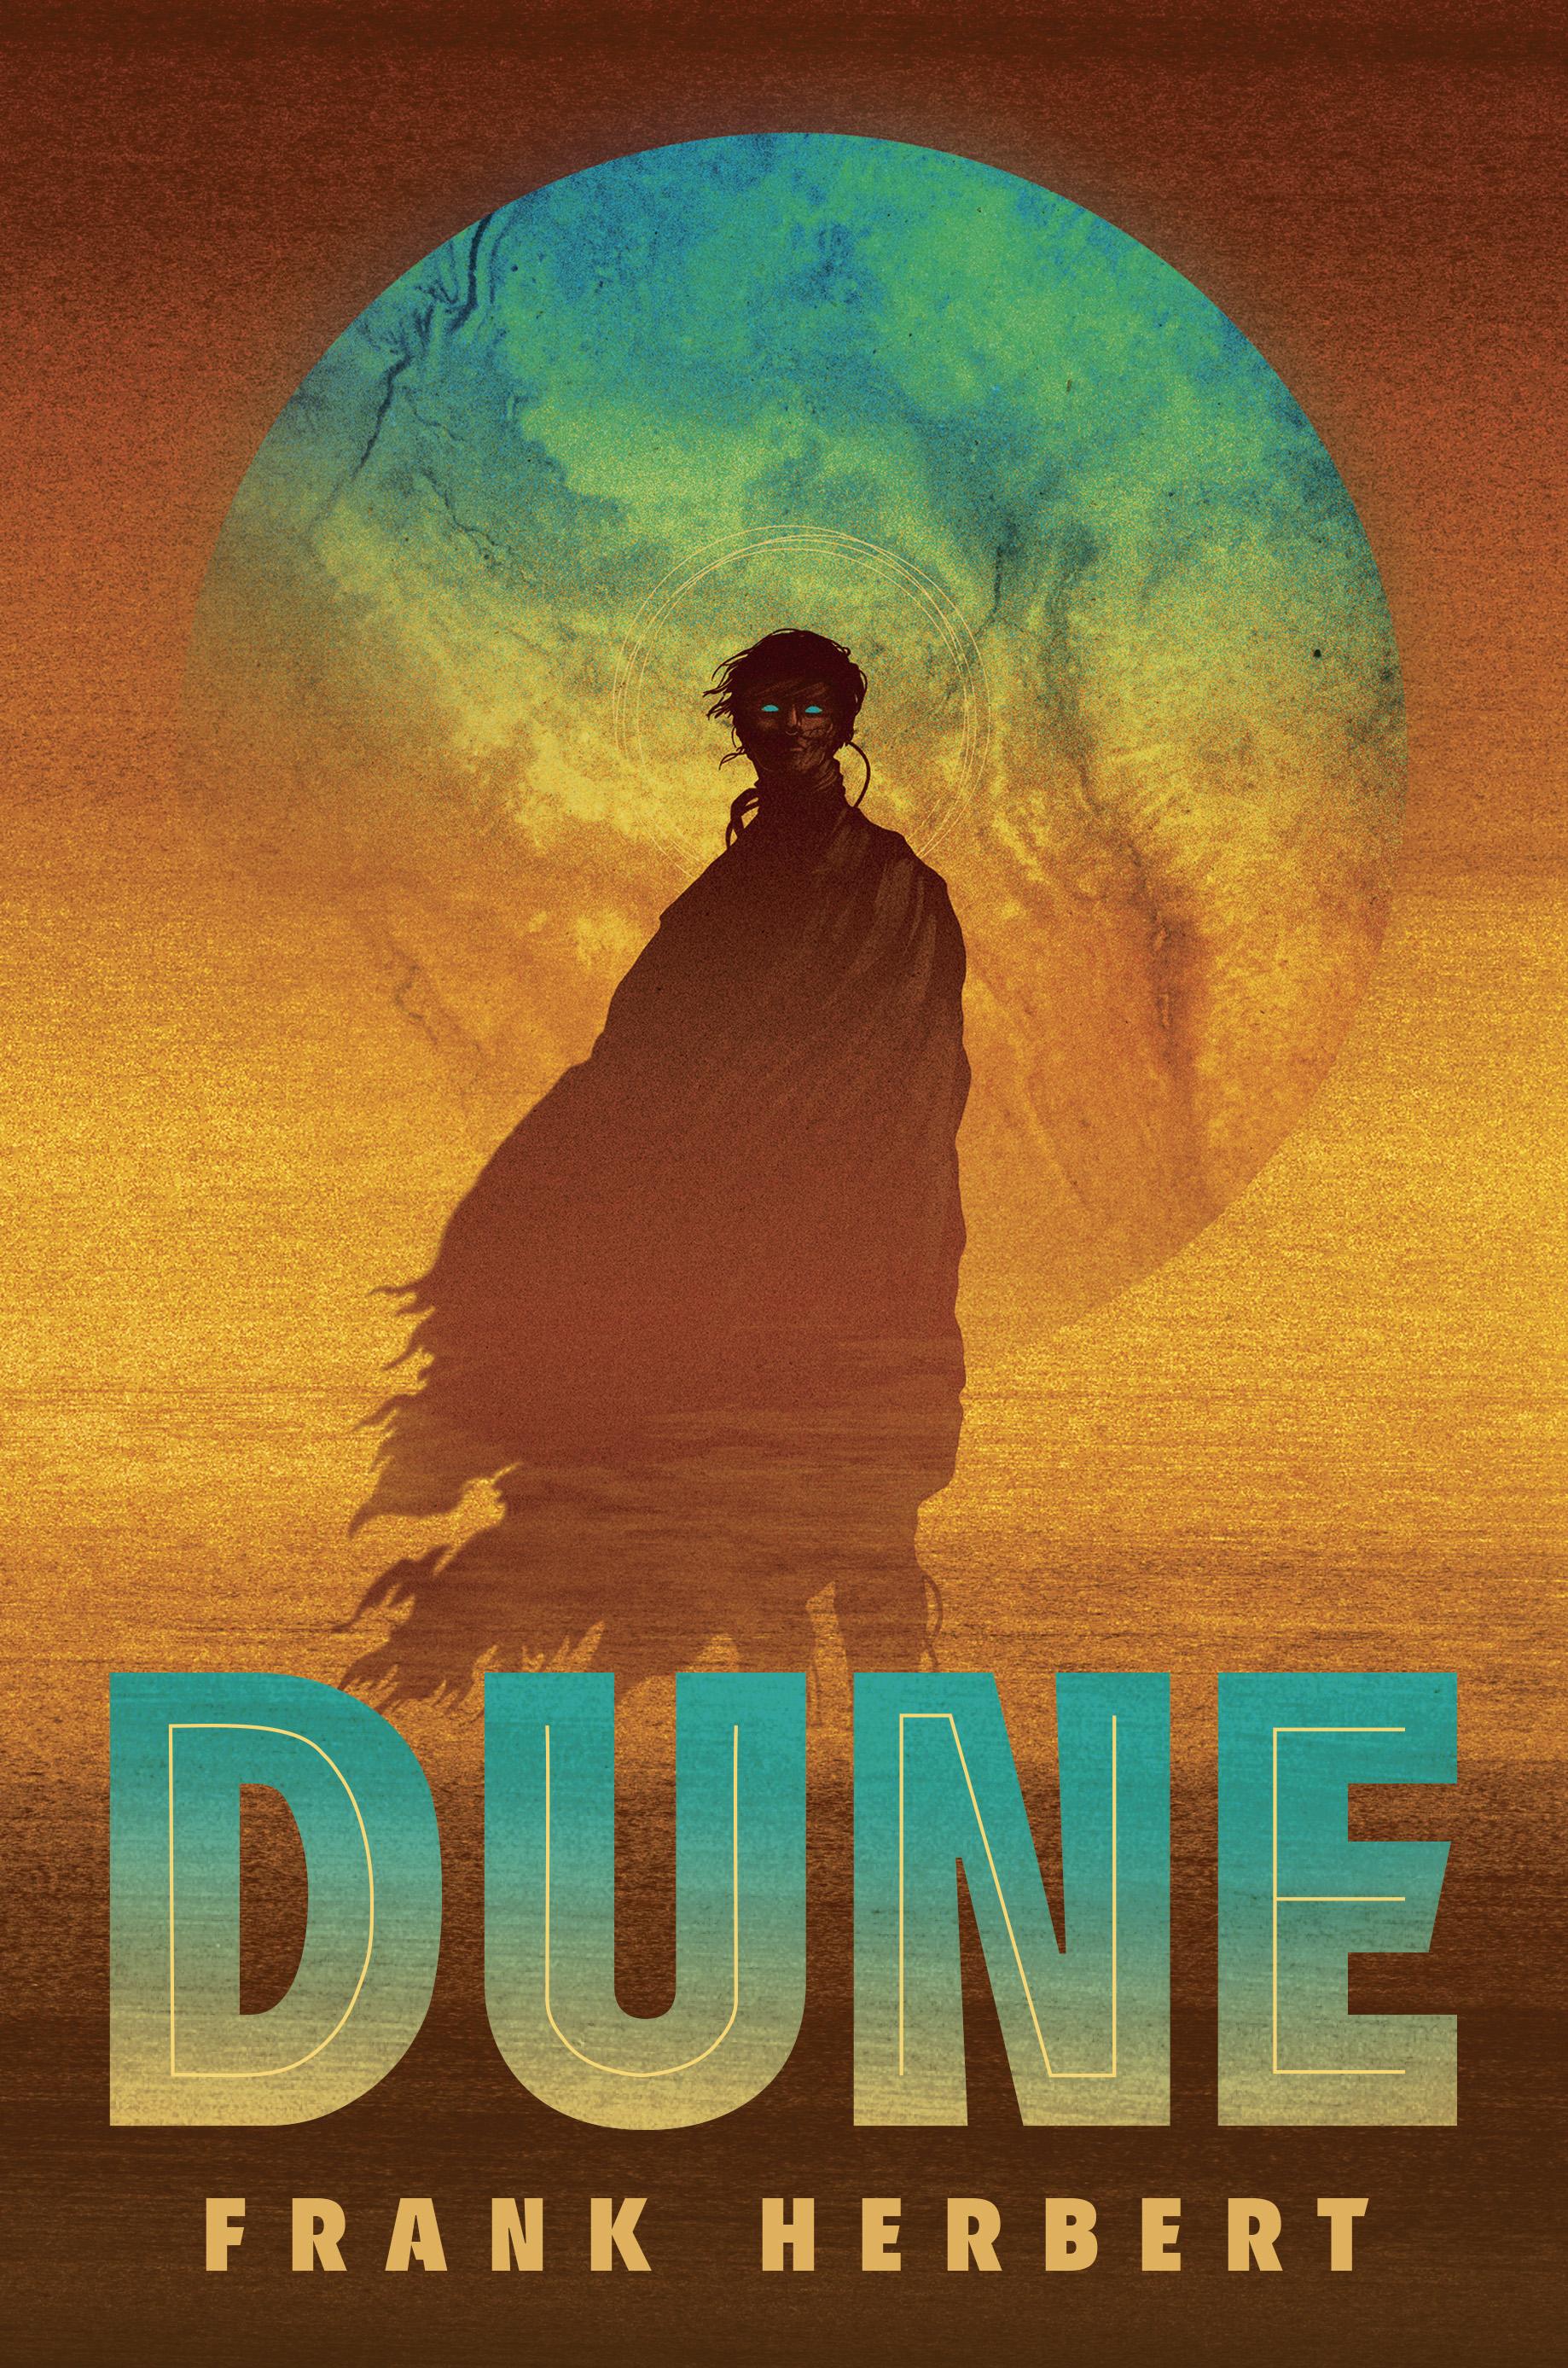 https://i1.wp.com/www.tor.com/wp-content/uploads/2019/07/Dune-cover-1.jpg